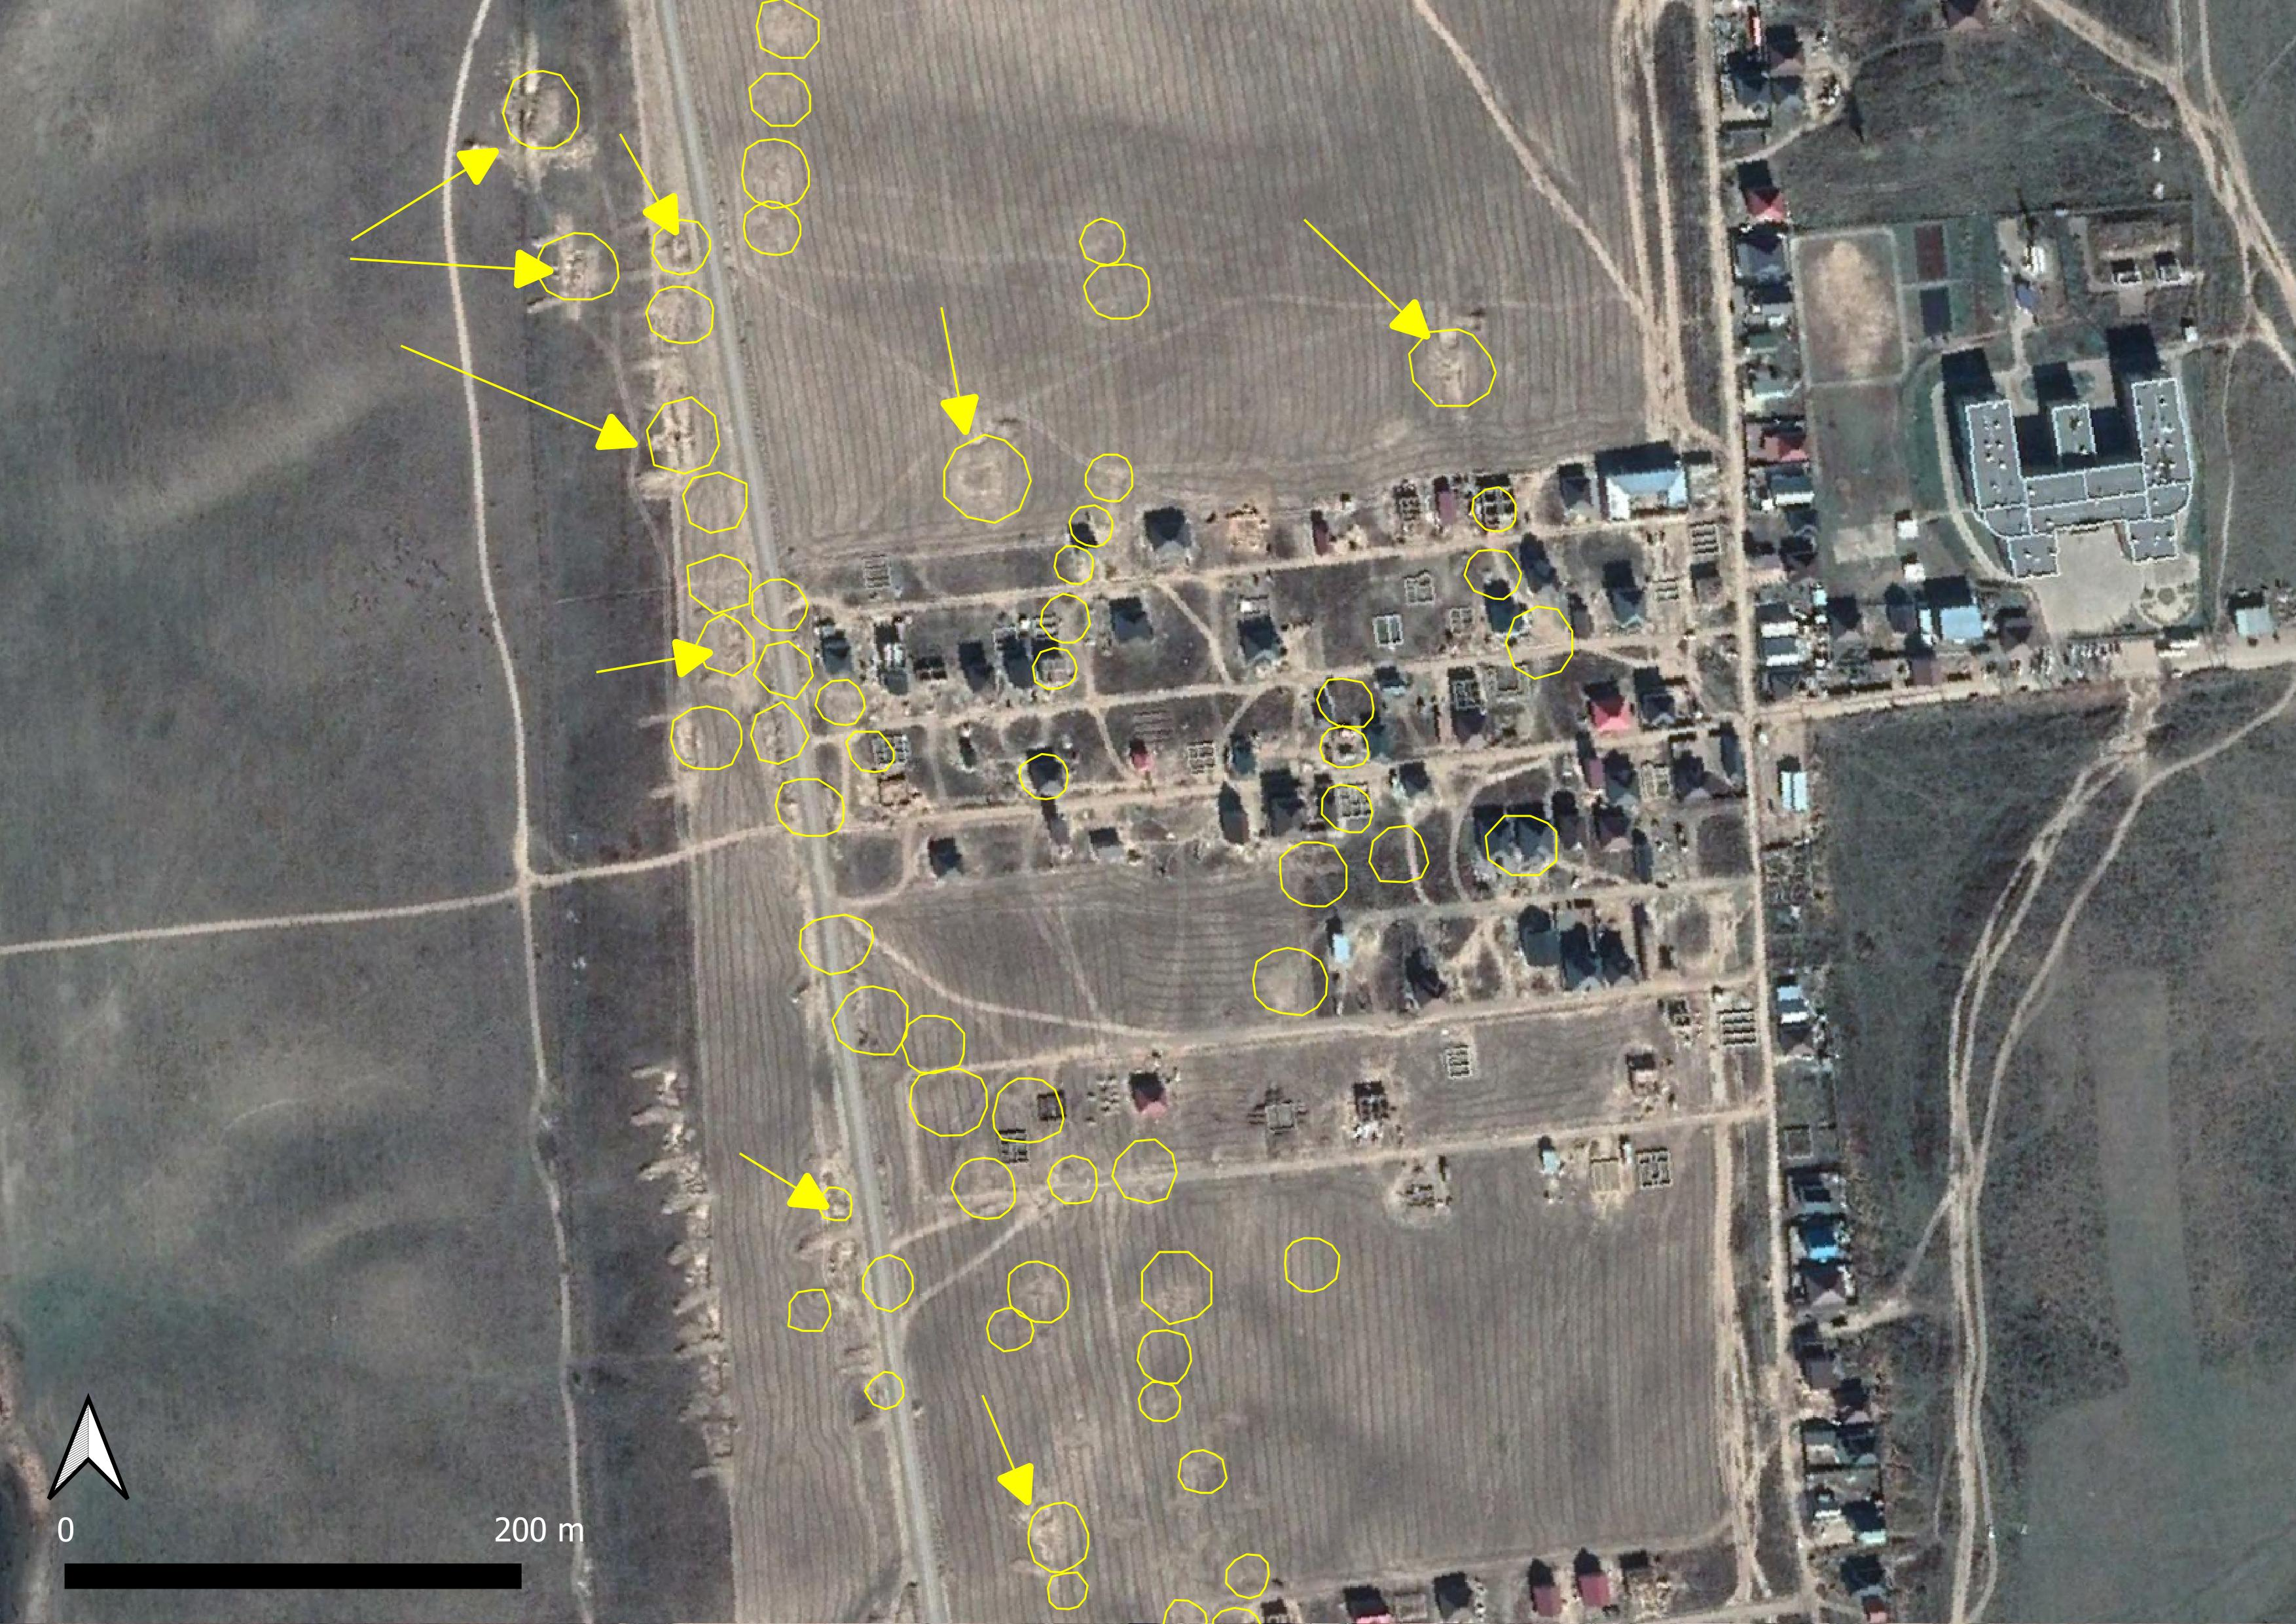 kurgans given sub-surface excavation, almaty